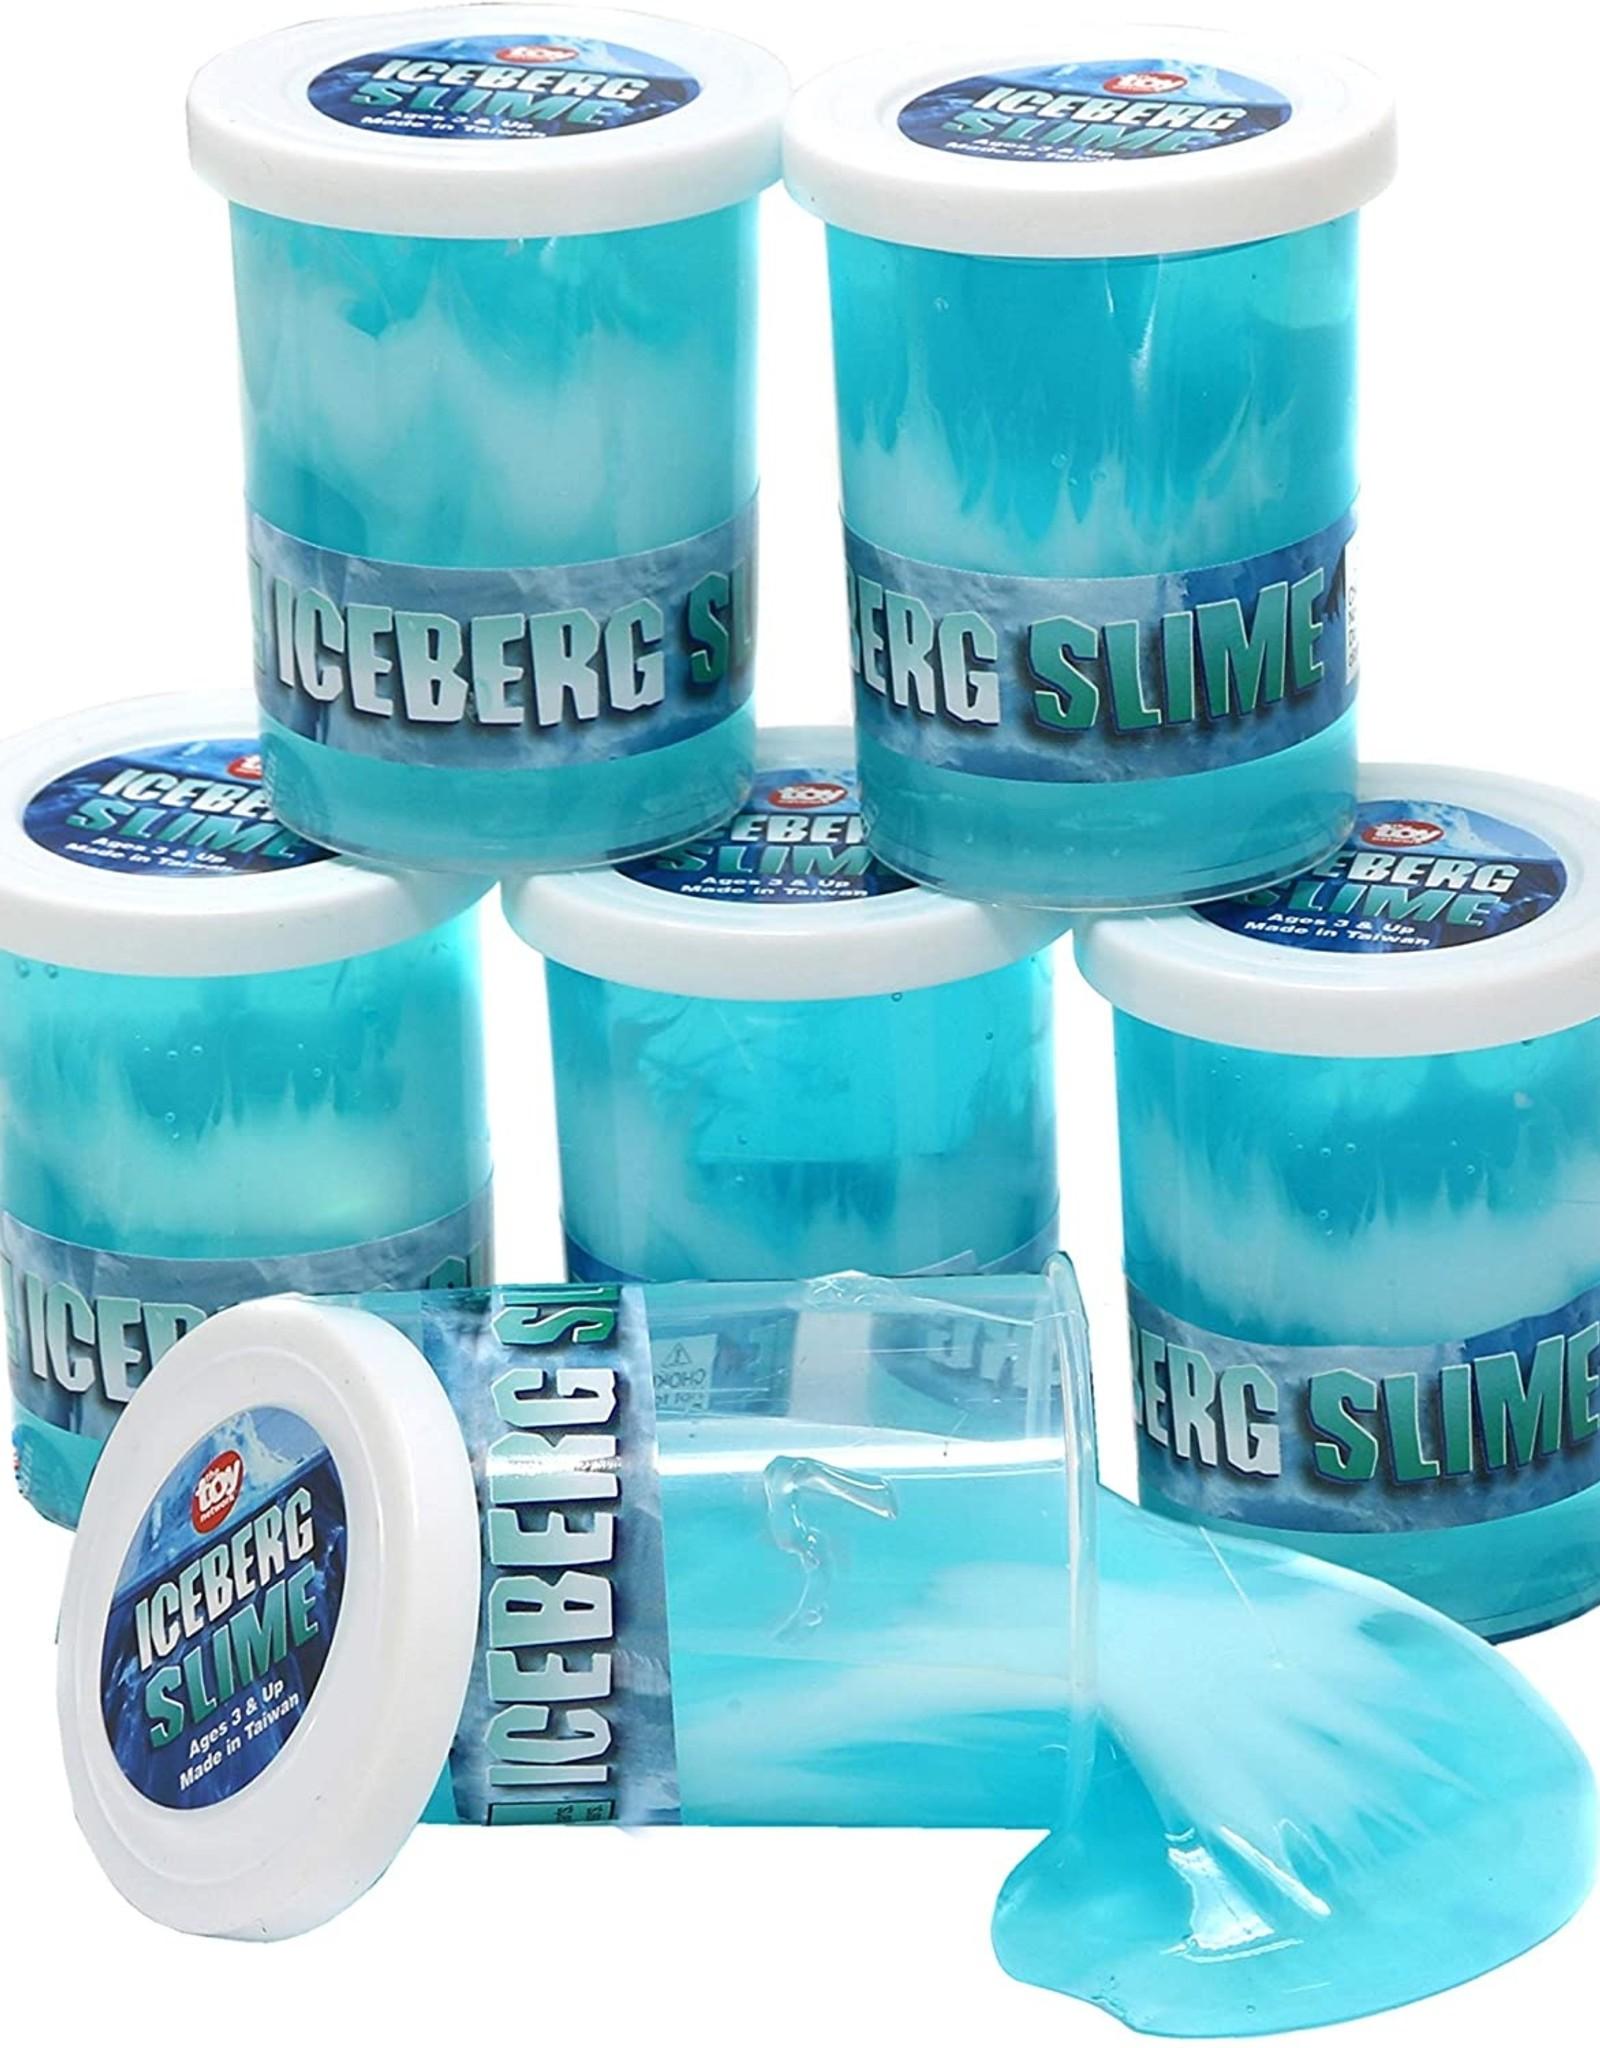 Iceberg Slime